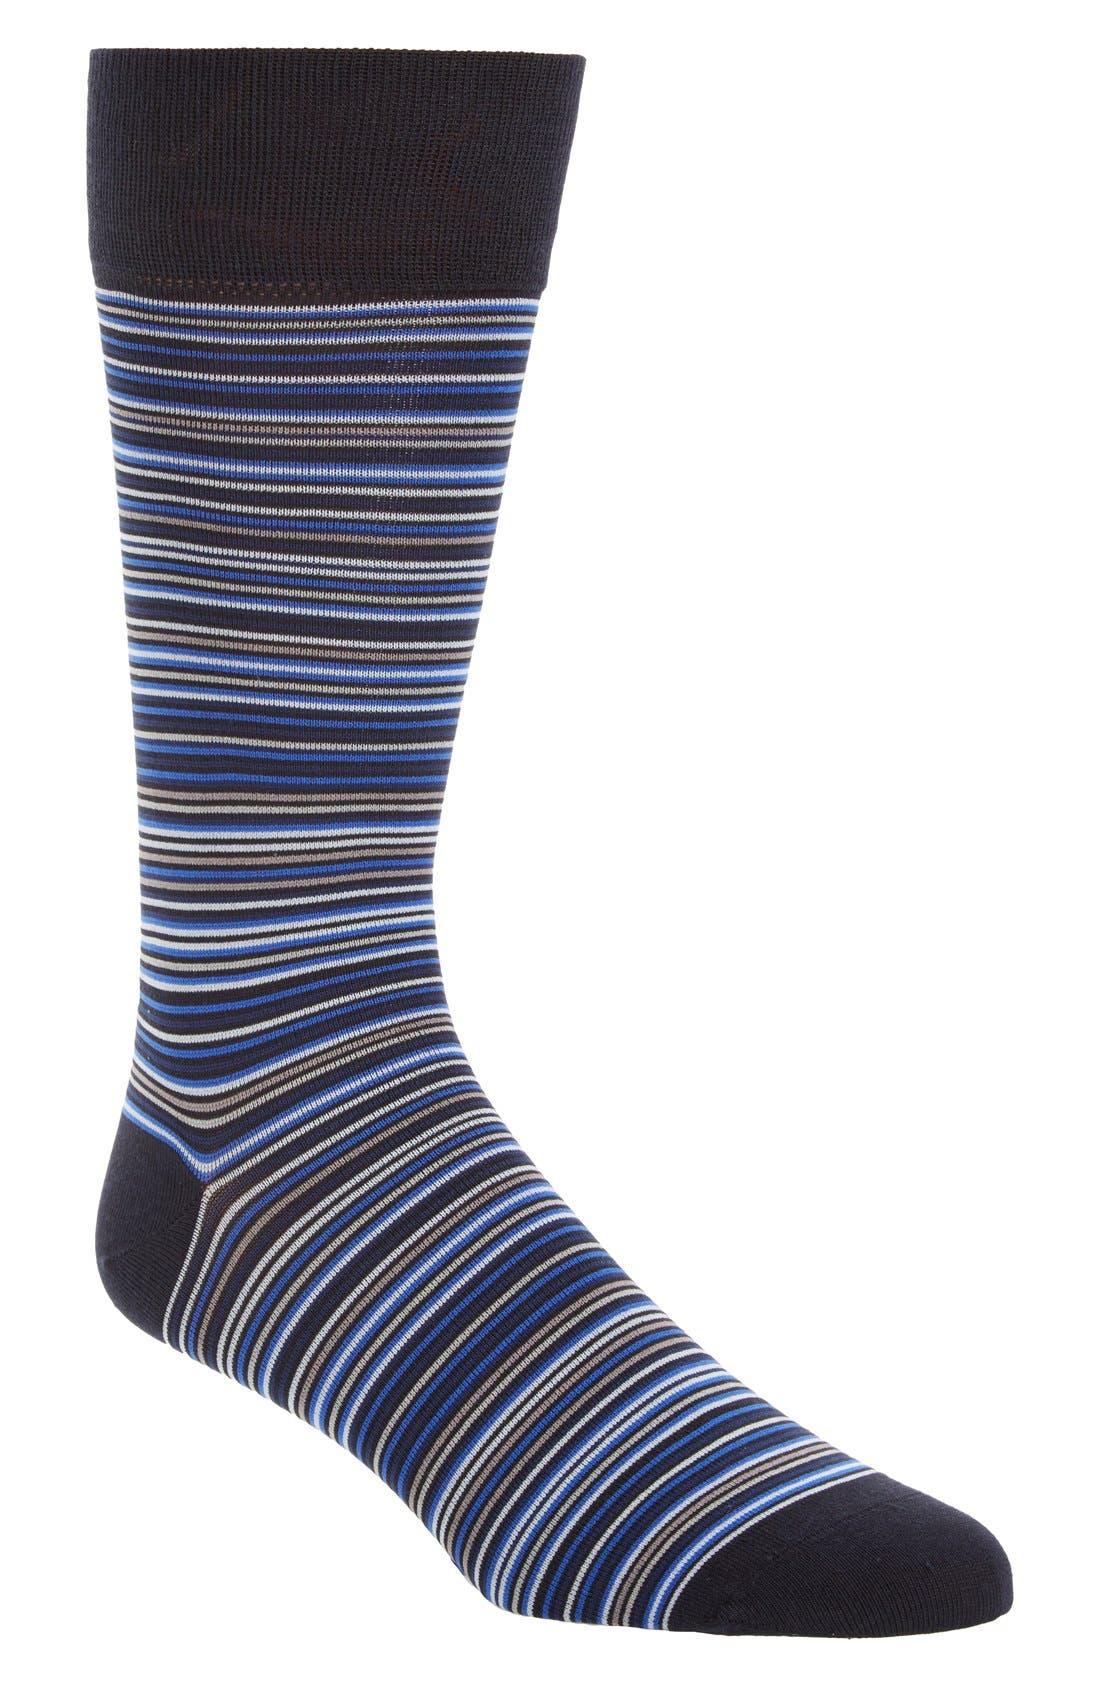 Alternate Image 1 Selected - Cole Haan Multi Stripe Crew Socks (3 for $30)